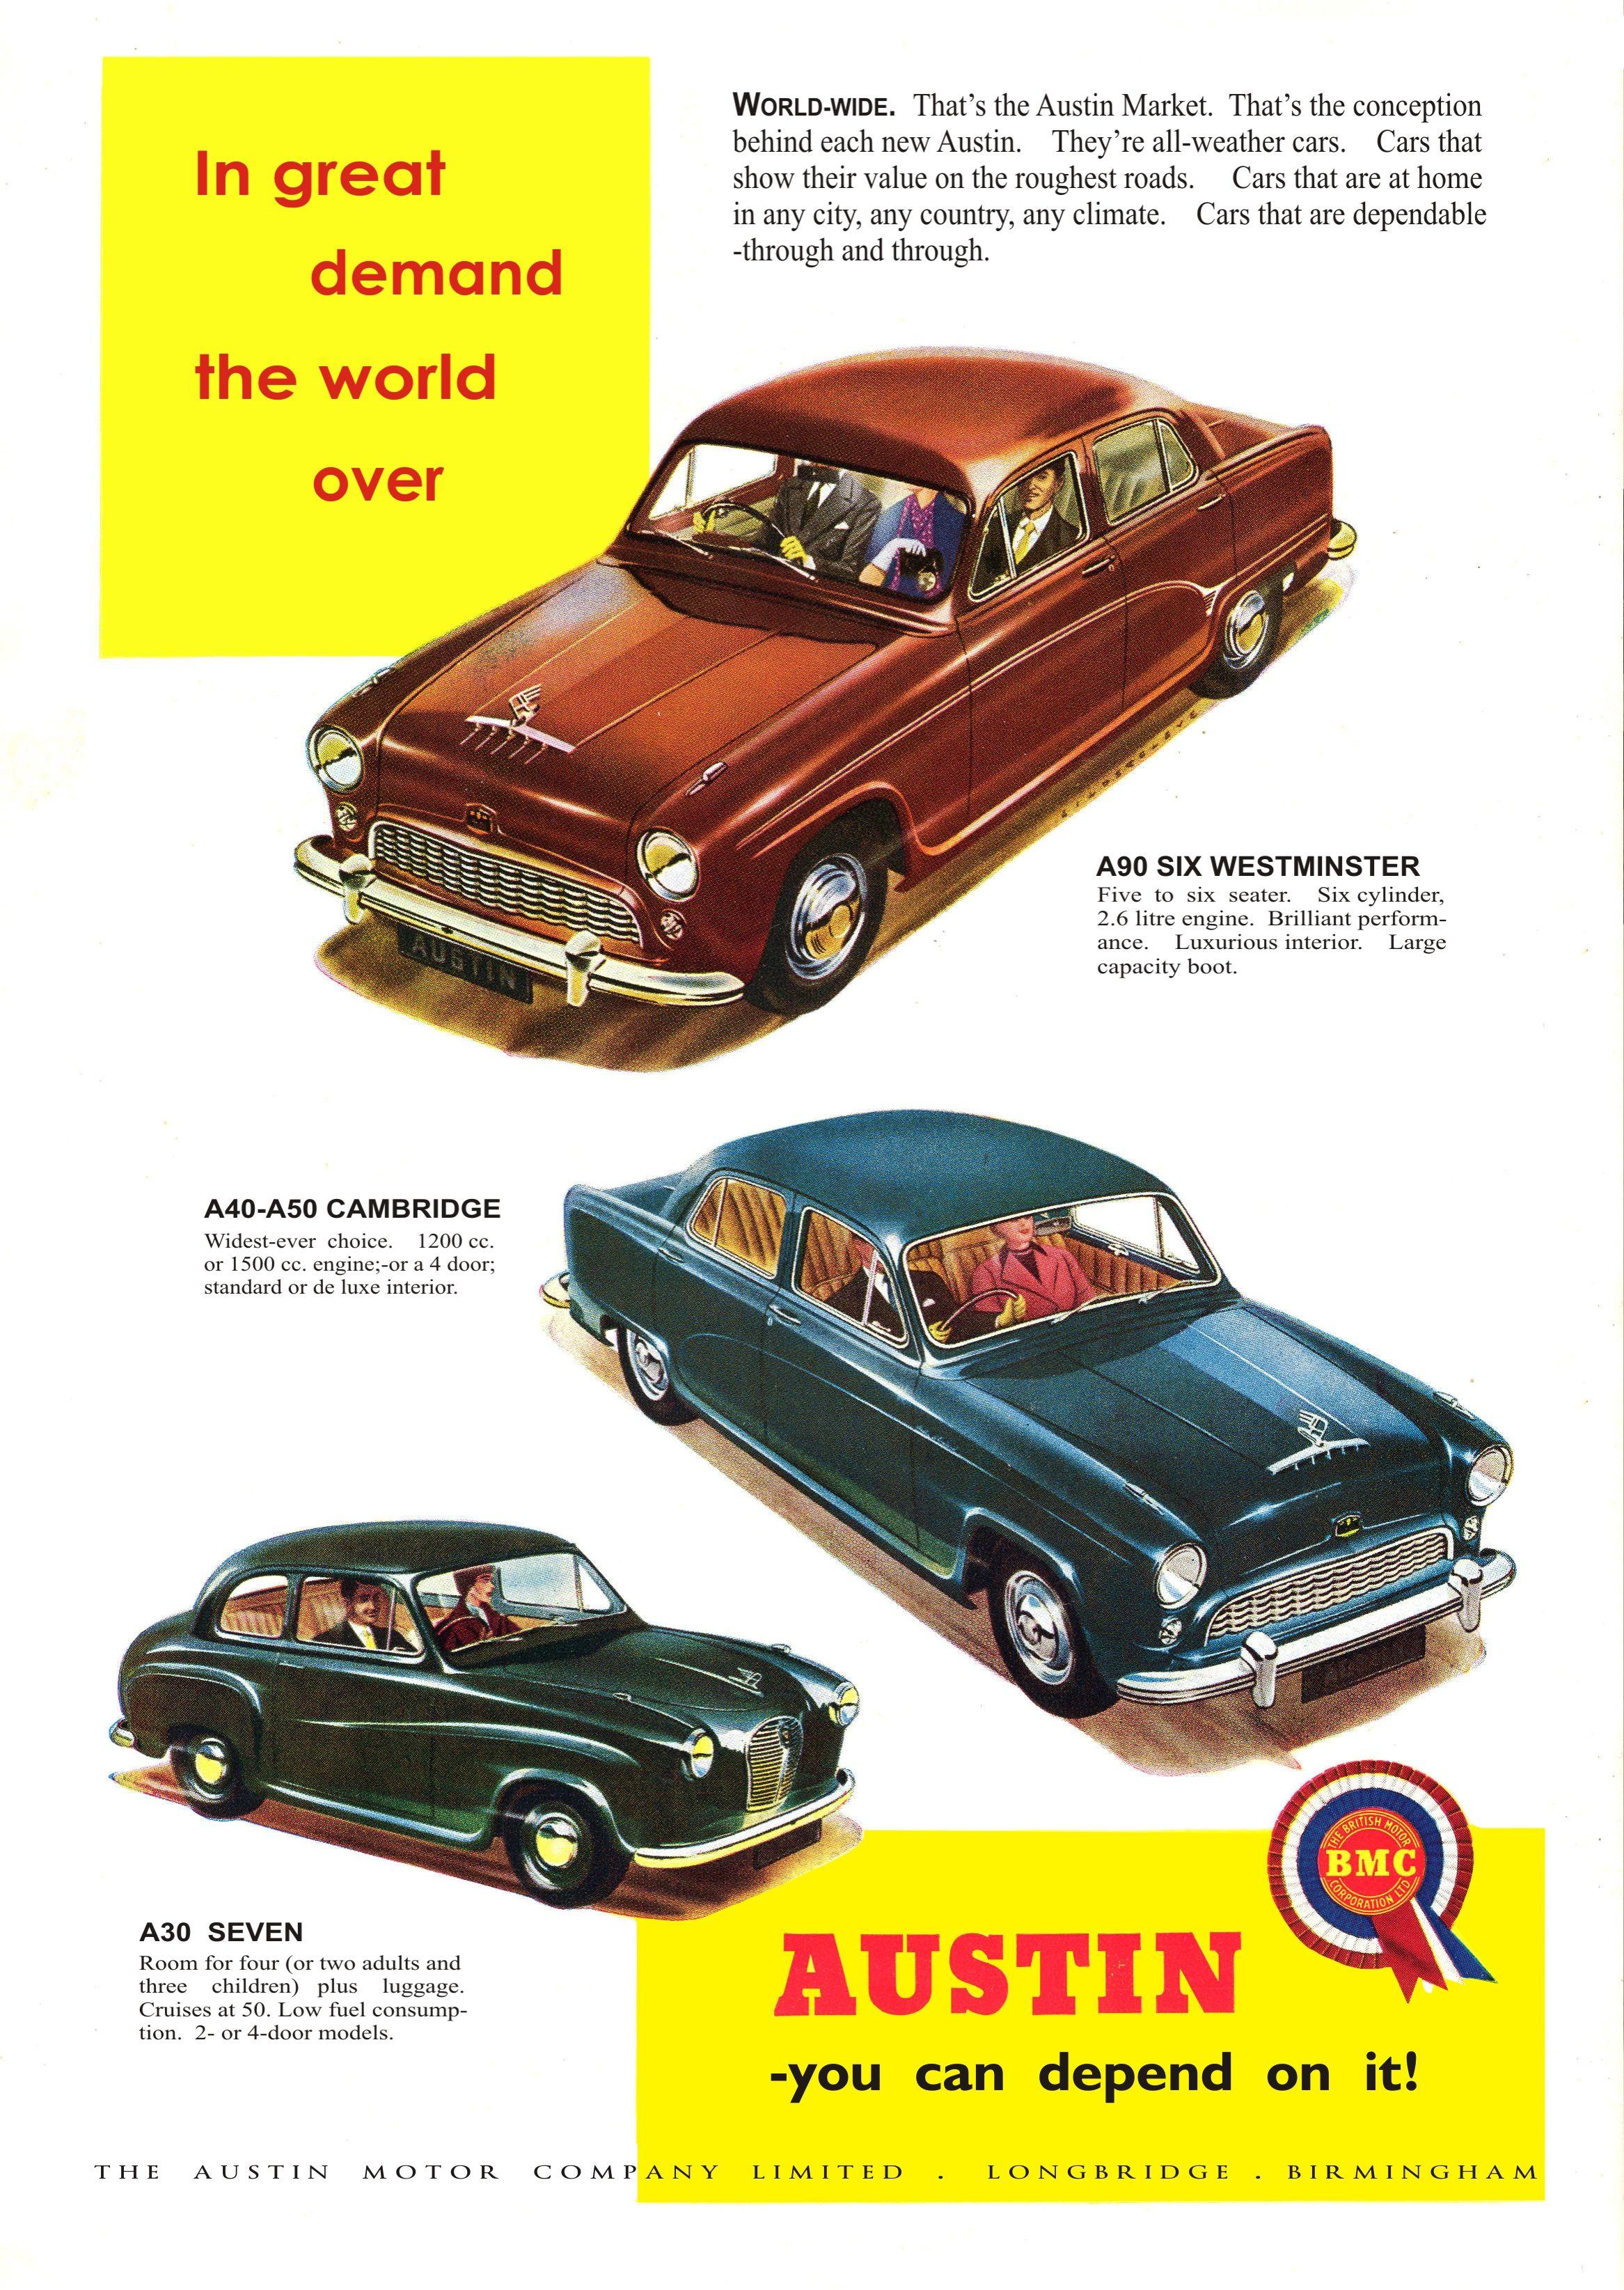 Car Advert Austin Range | Vintage Auto Advertising | Pinterest ...